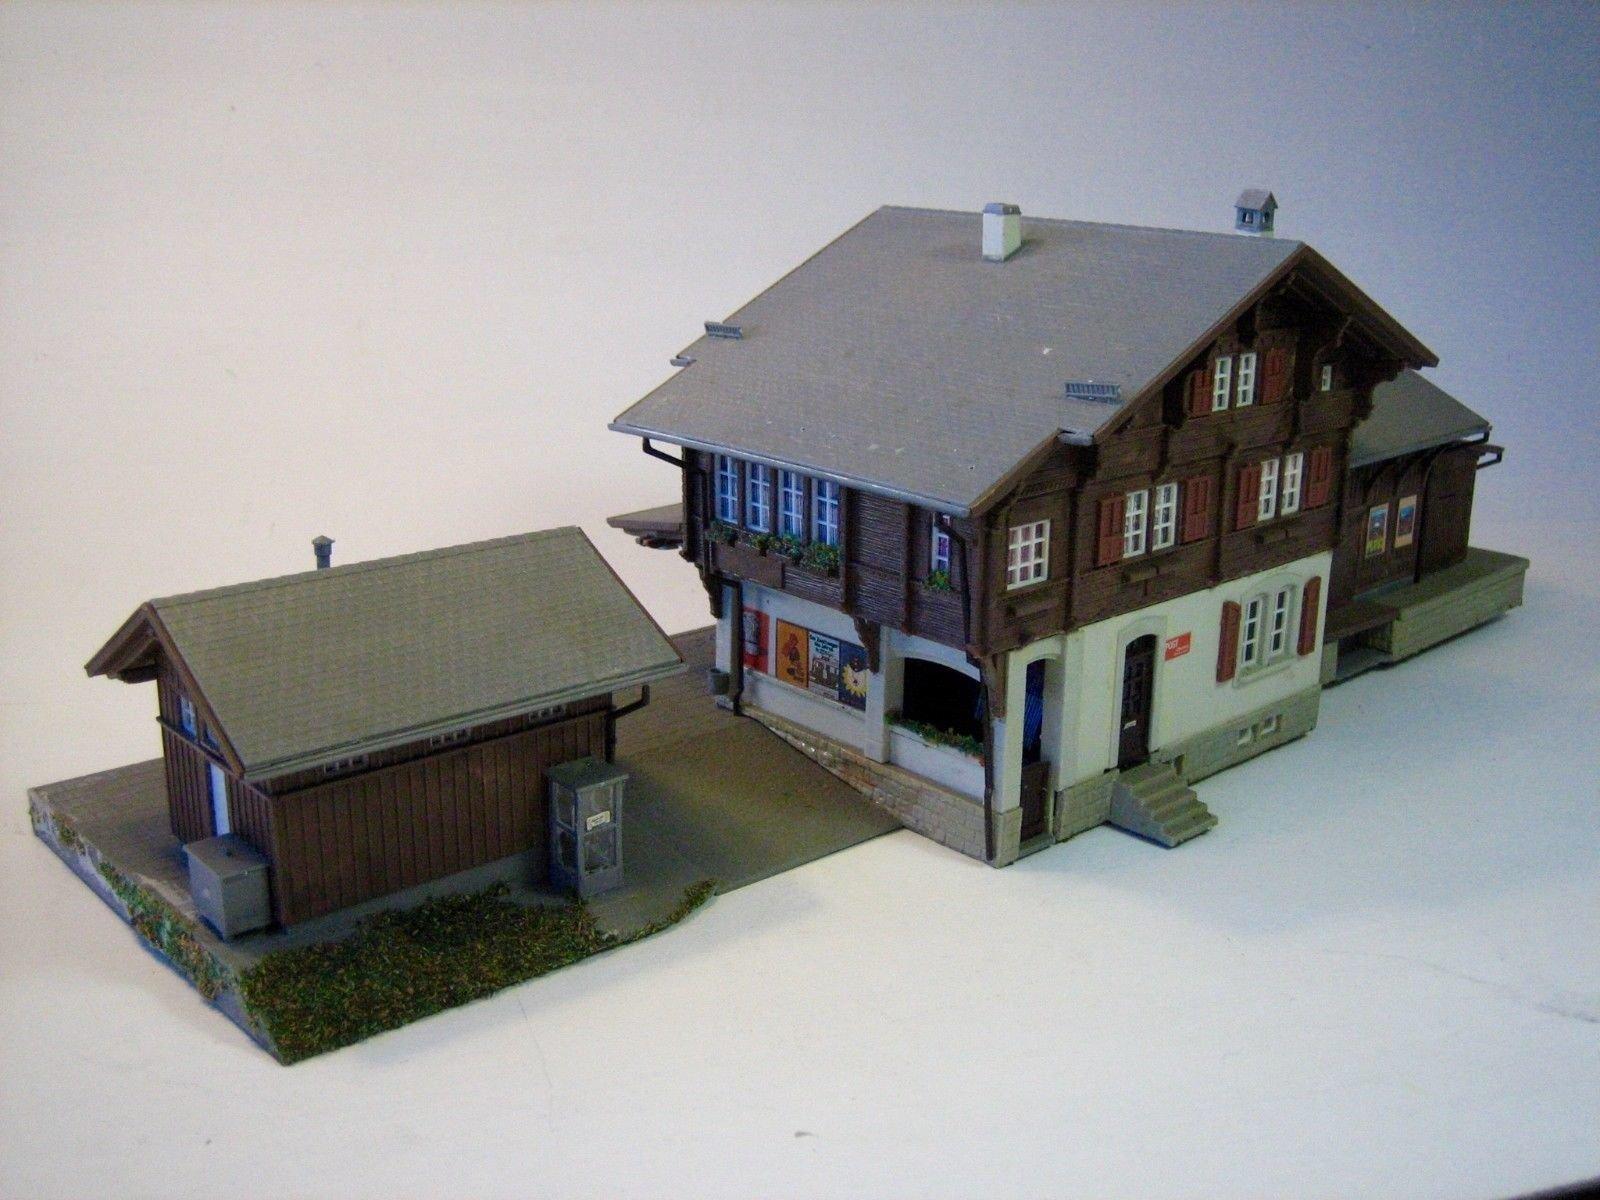 SC001 KIBRI 'OBERRIED' SWISS CHALET RAILWAY STATION